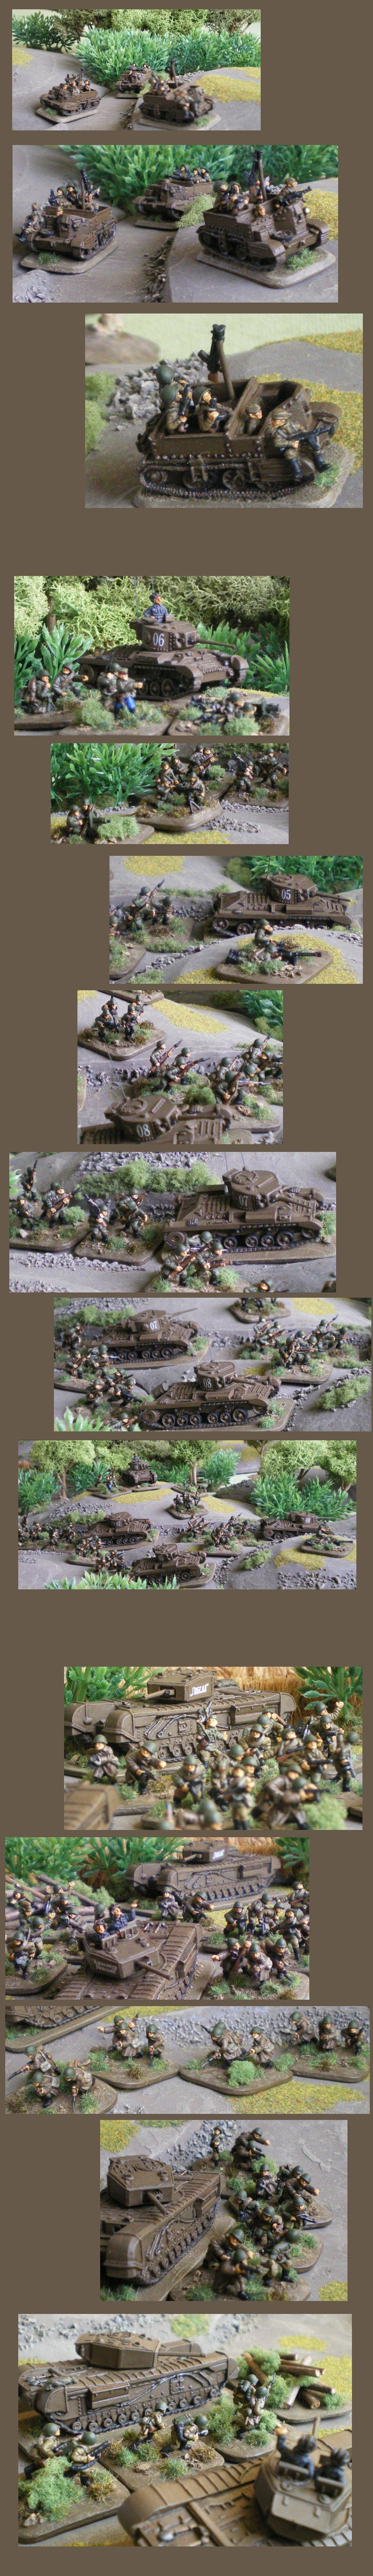 La Grande Guerre Patriotique, Acte II: la crise (15mm) 16012001052694130